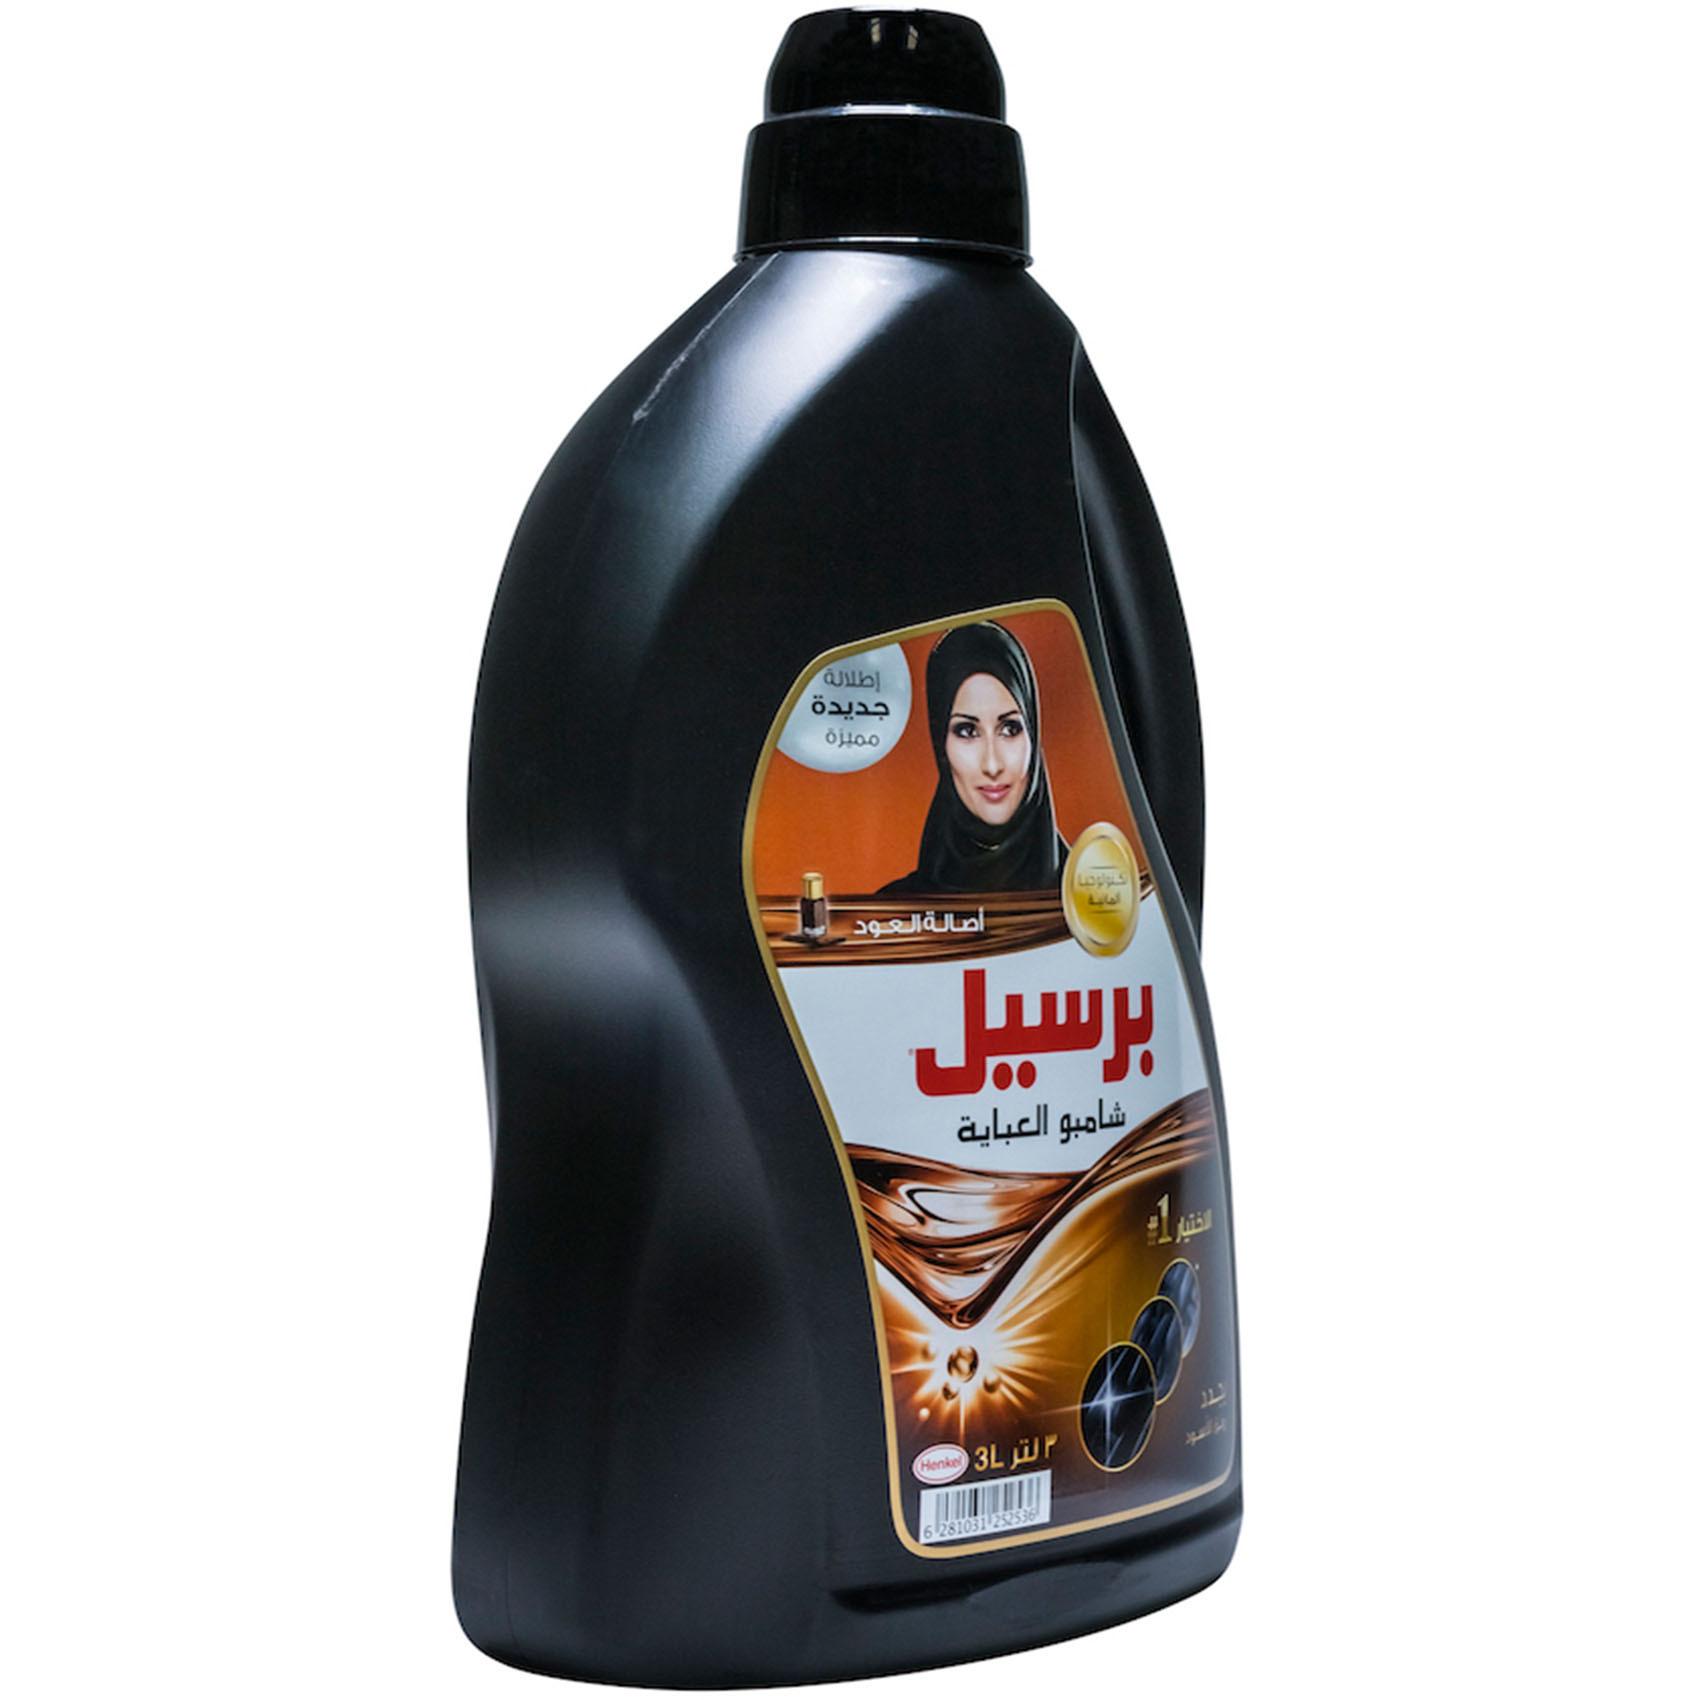 Buy Persil Abaya Asalat Al Oud Shampoo 3l Online In Uae Carrefour Black 2 Pcs Blk Smpoo Oudh 3 Ltr